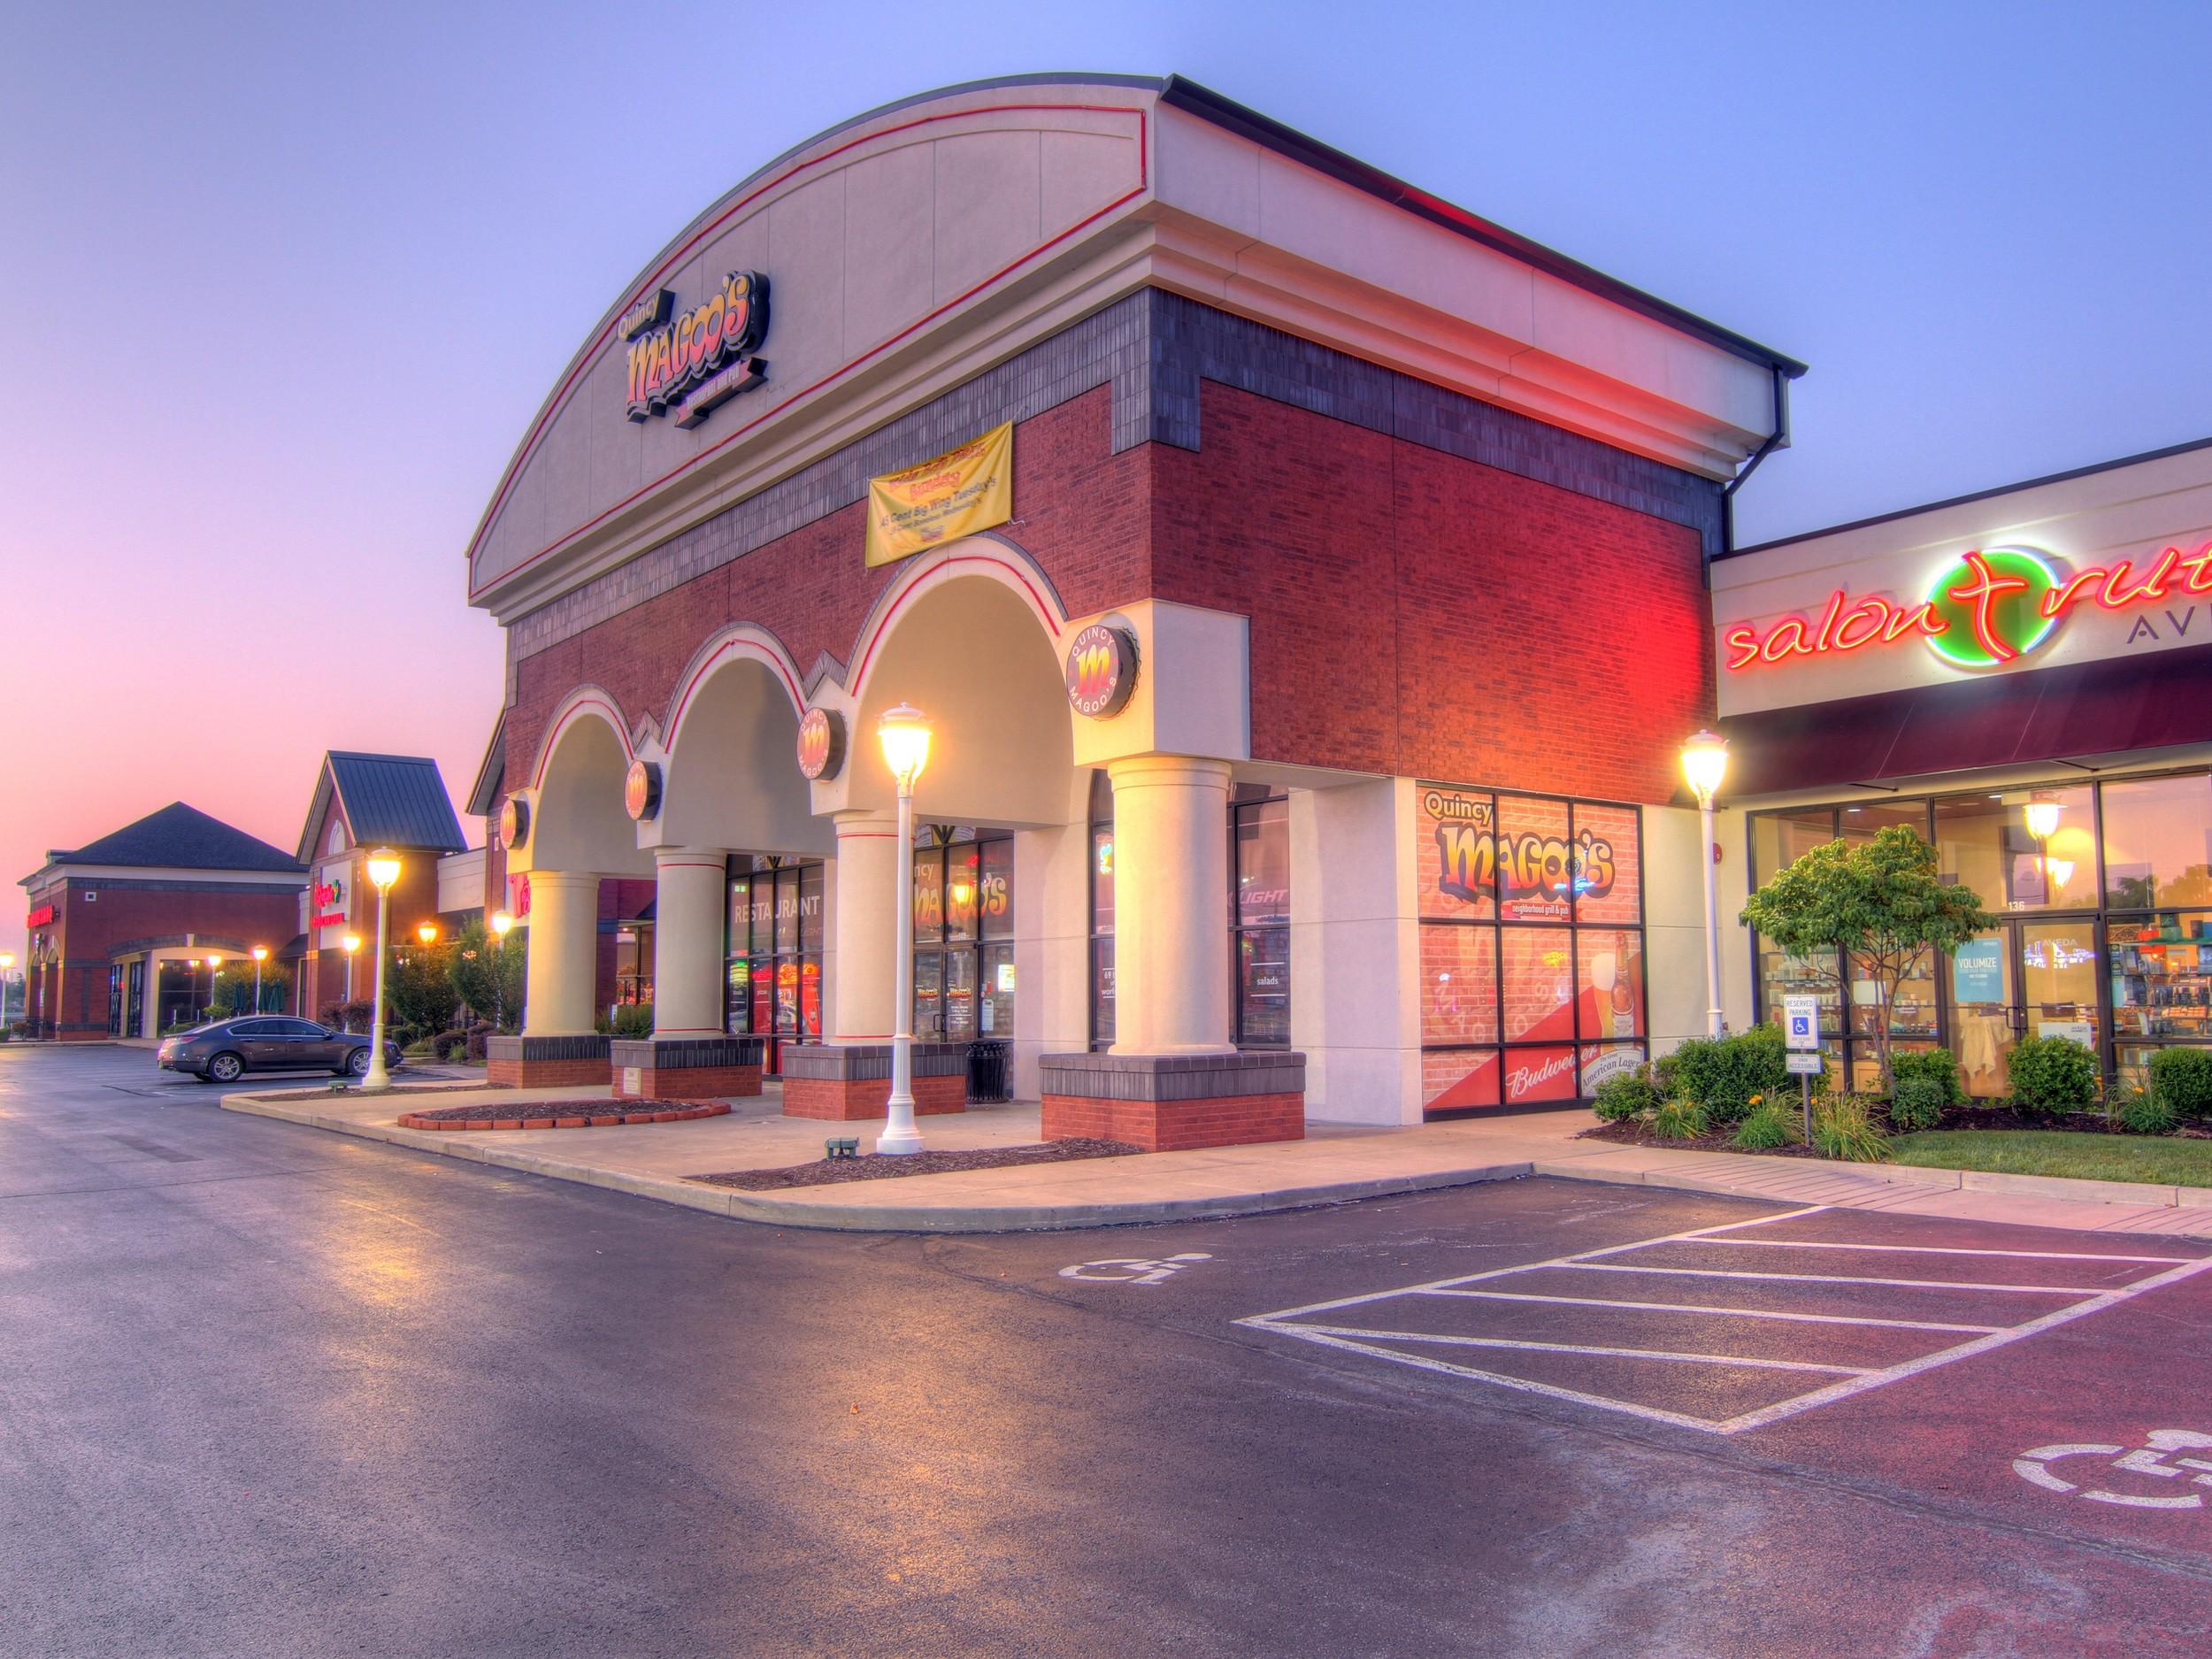 Retail Architecture Slone Architects Interior Design